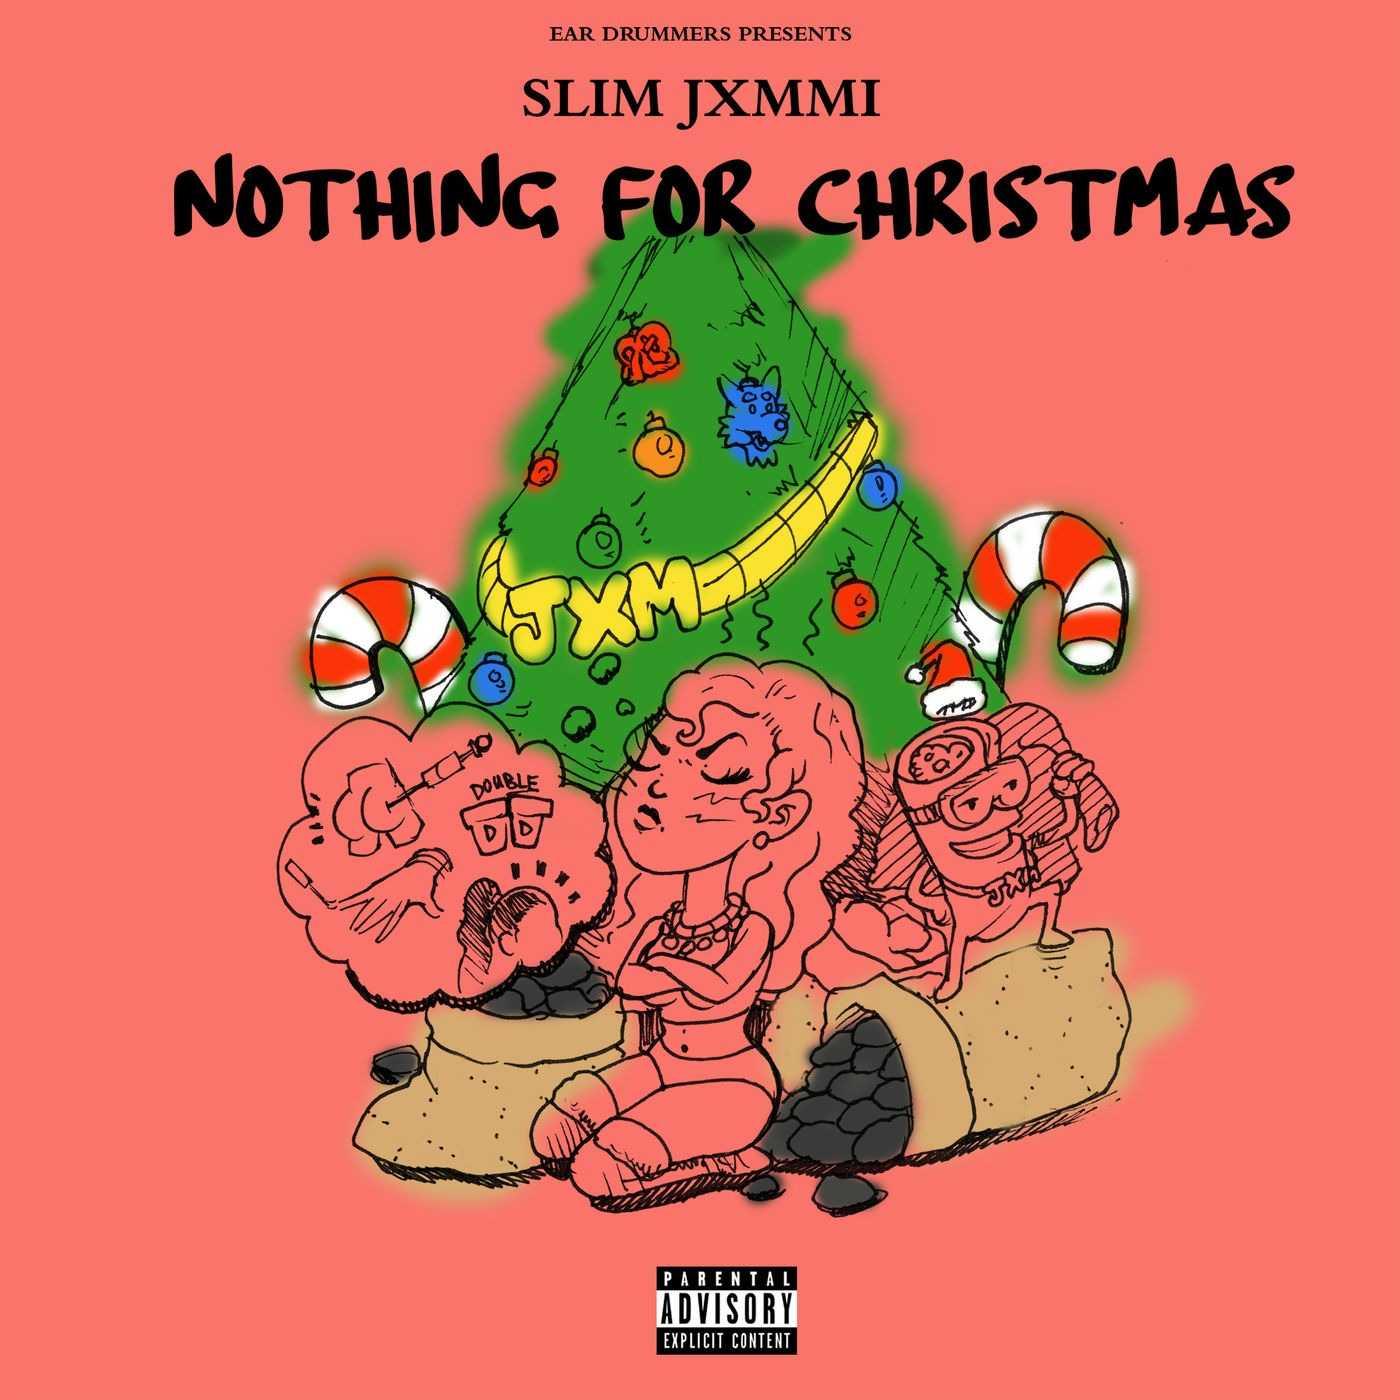 Slim Jxmmi